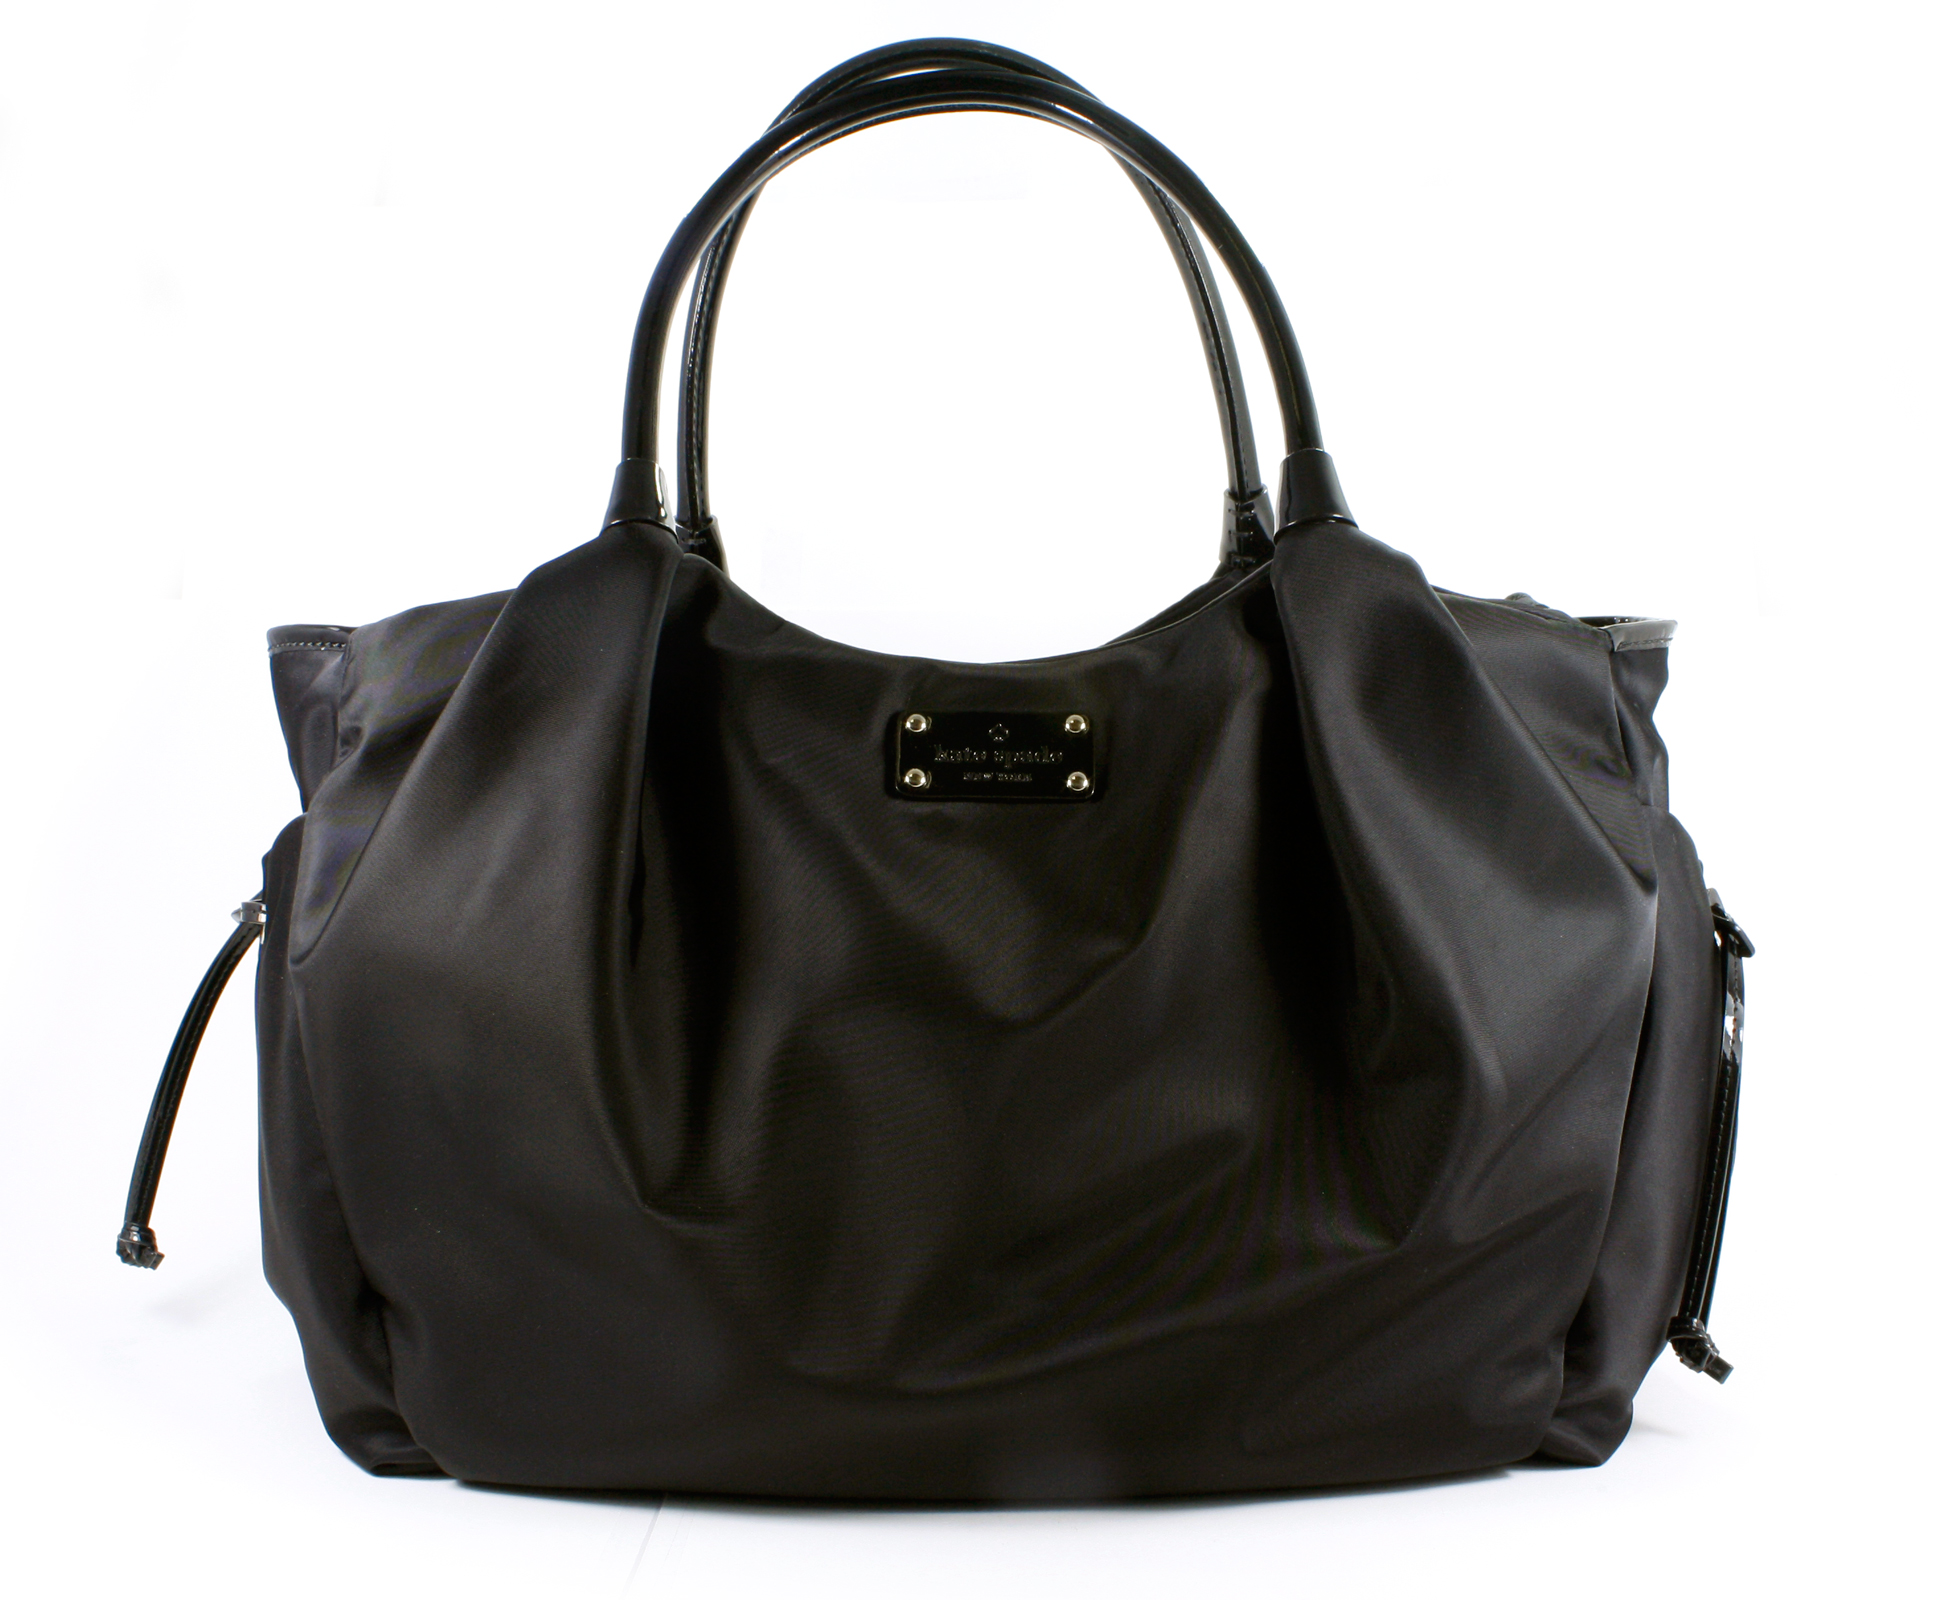 Kate Spade Stevie Baby Bag Basic Nylon Black Diaper Tote Purse New